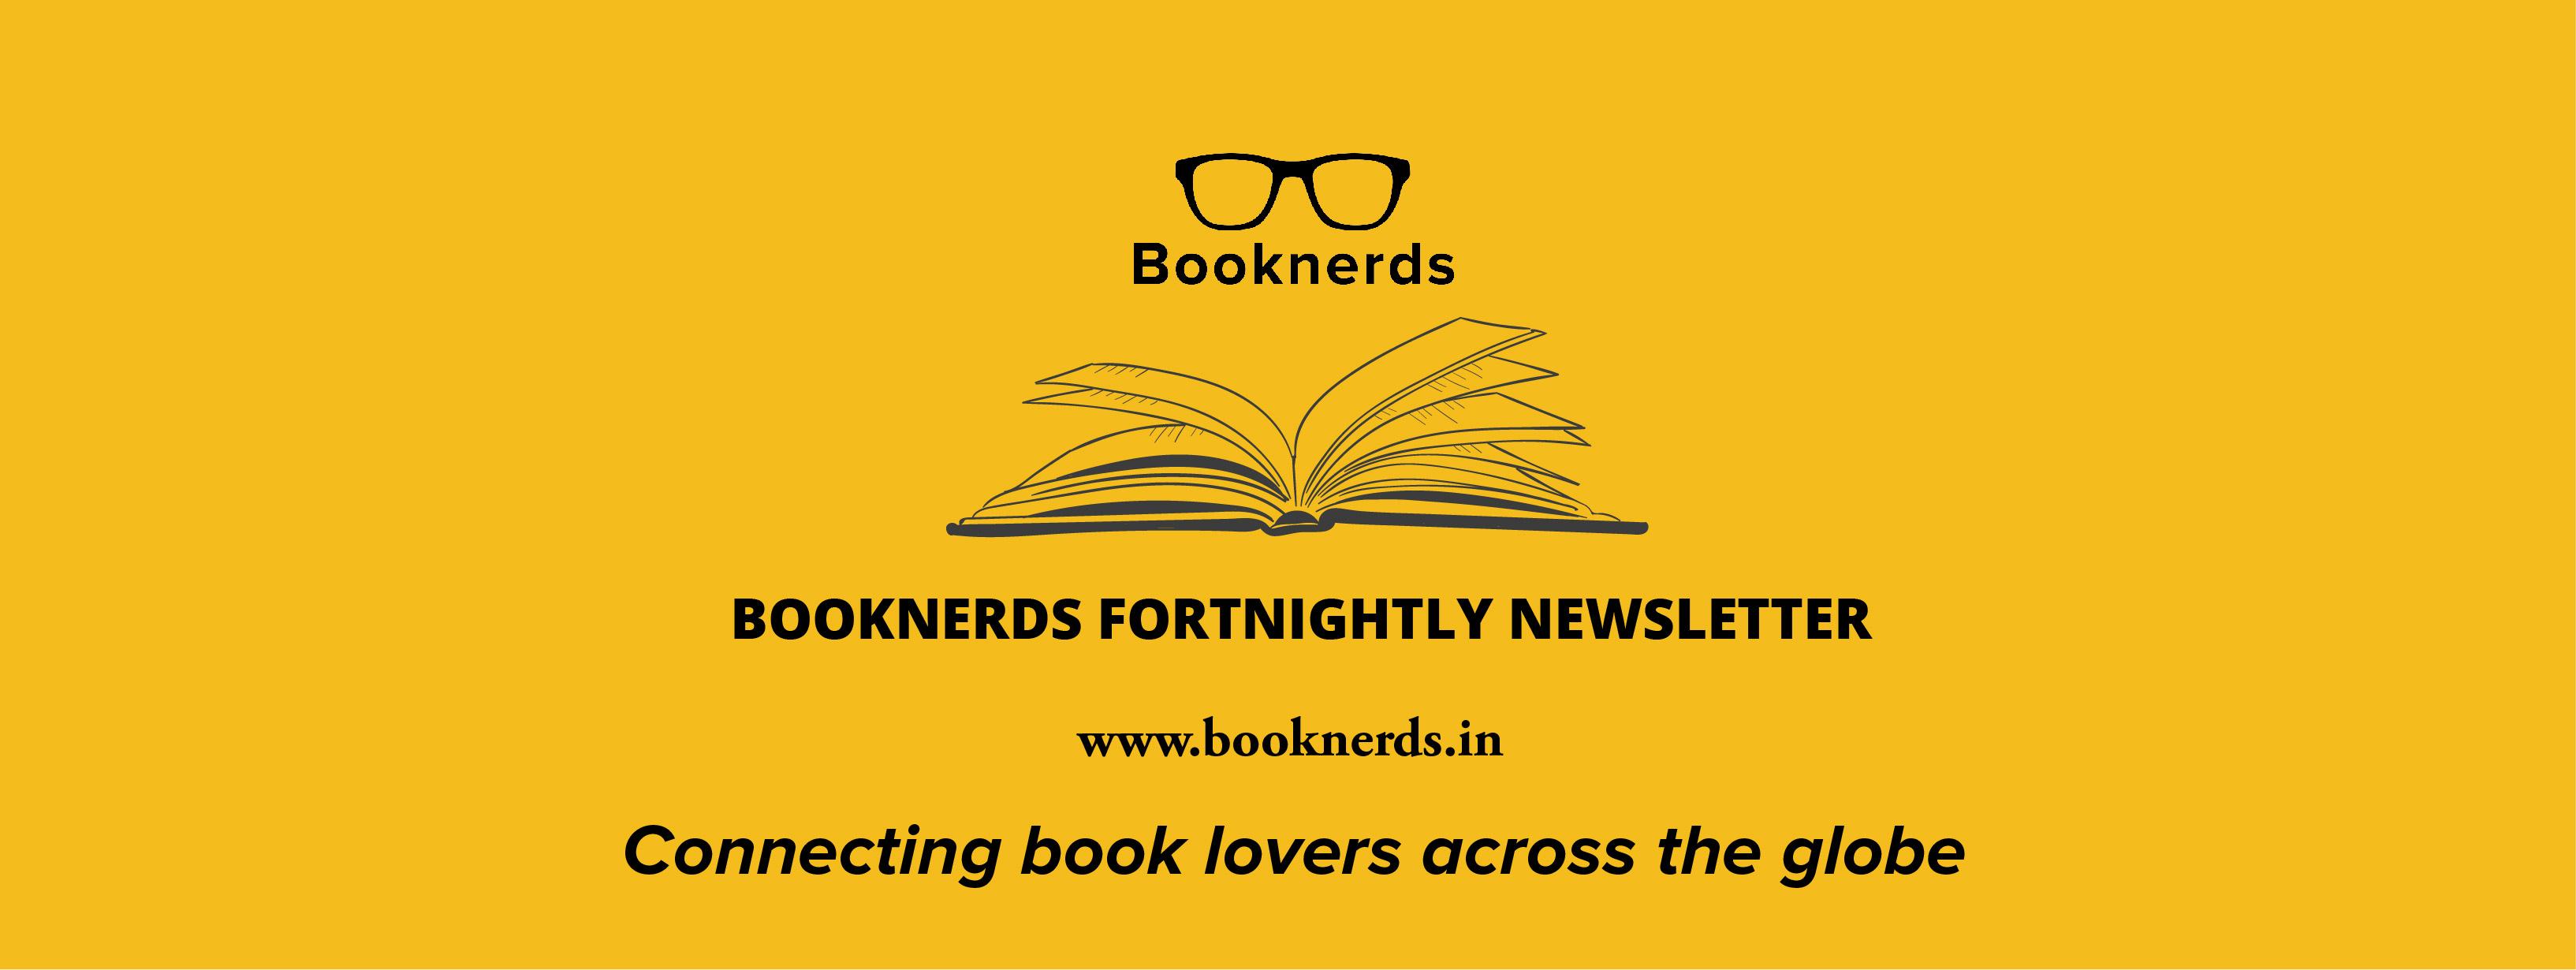 Booknerds Fortnightly Newsletter |July 1|2020